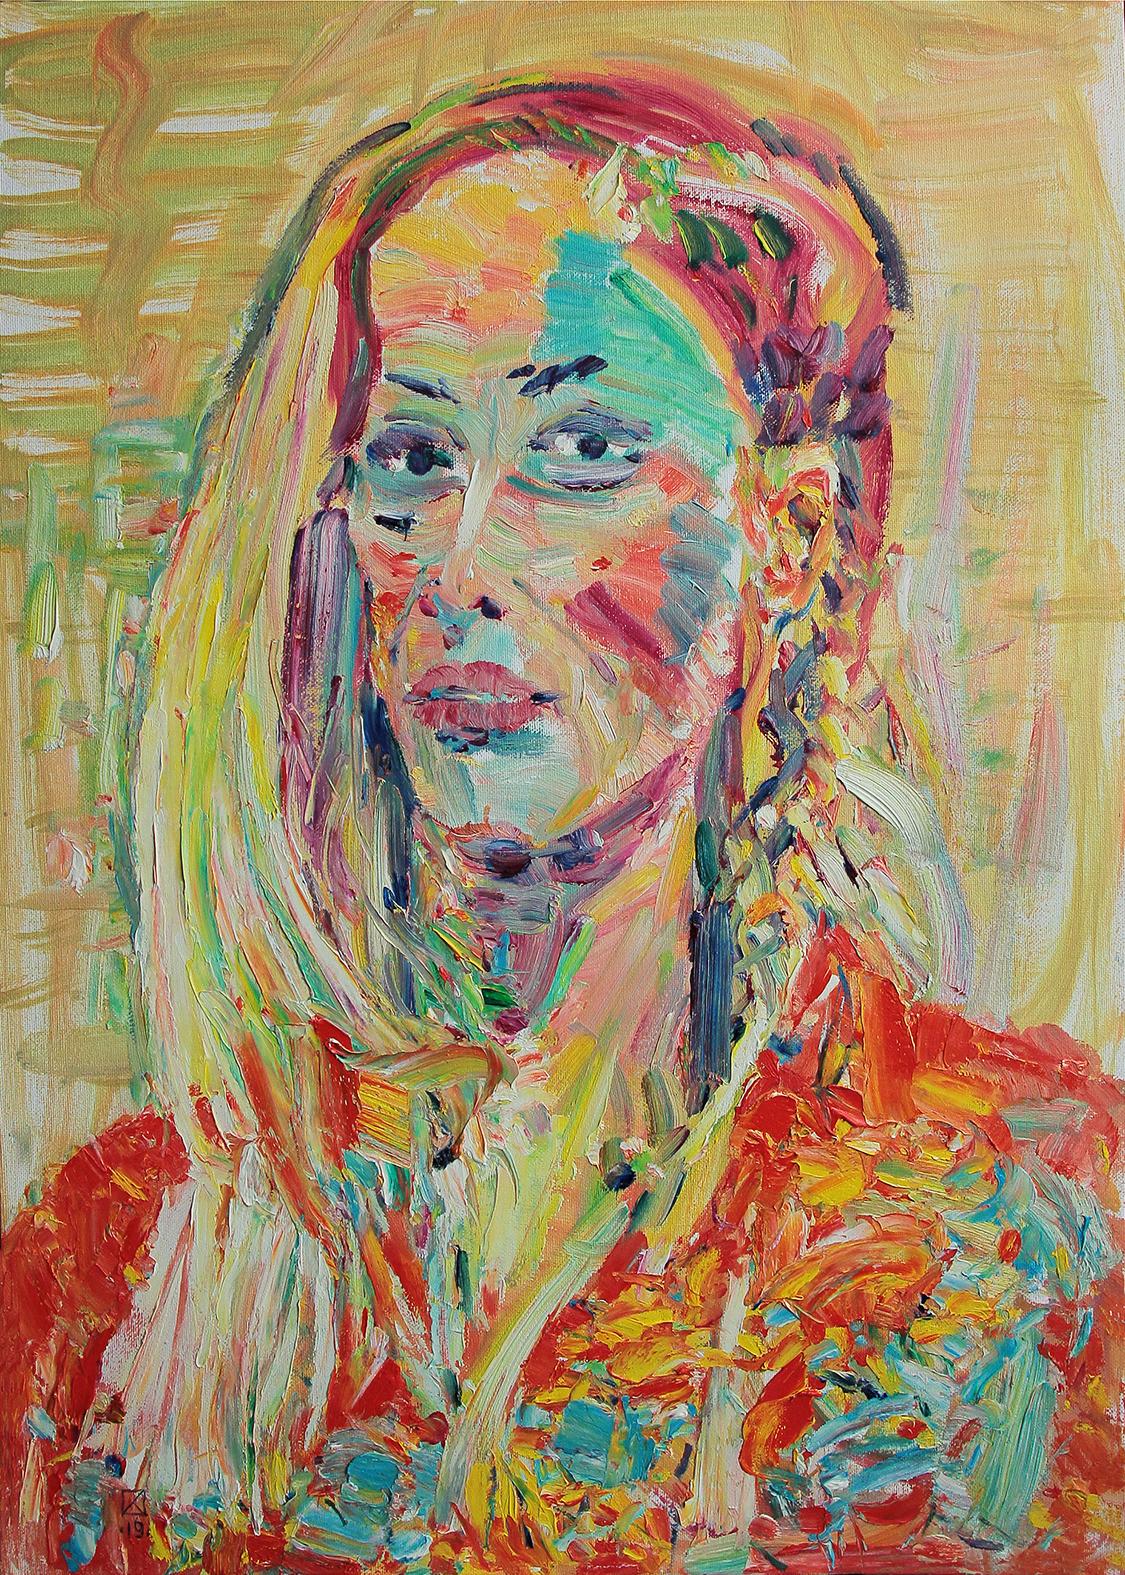 Female Portrait. 2019. Oil on canvas, cardboard. 70 x 50